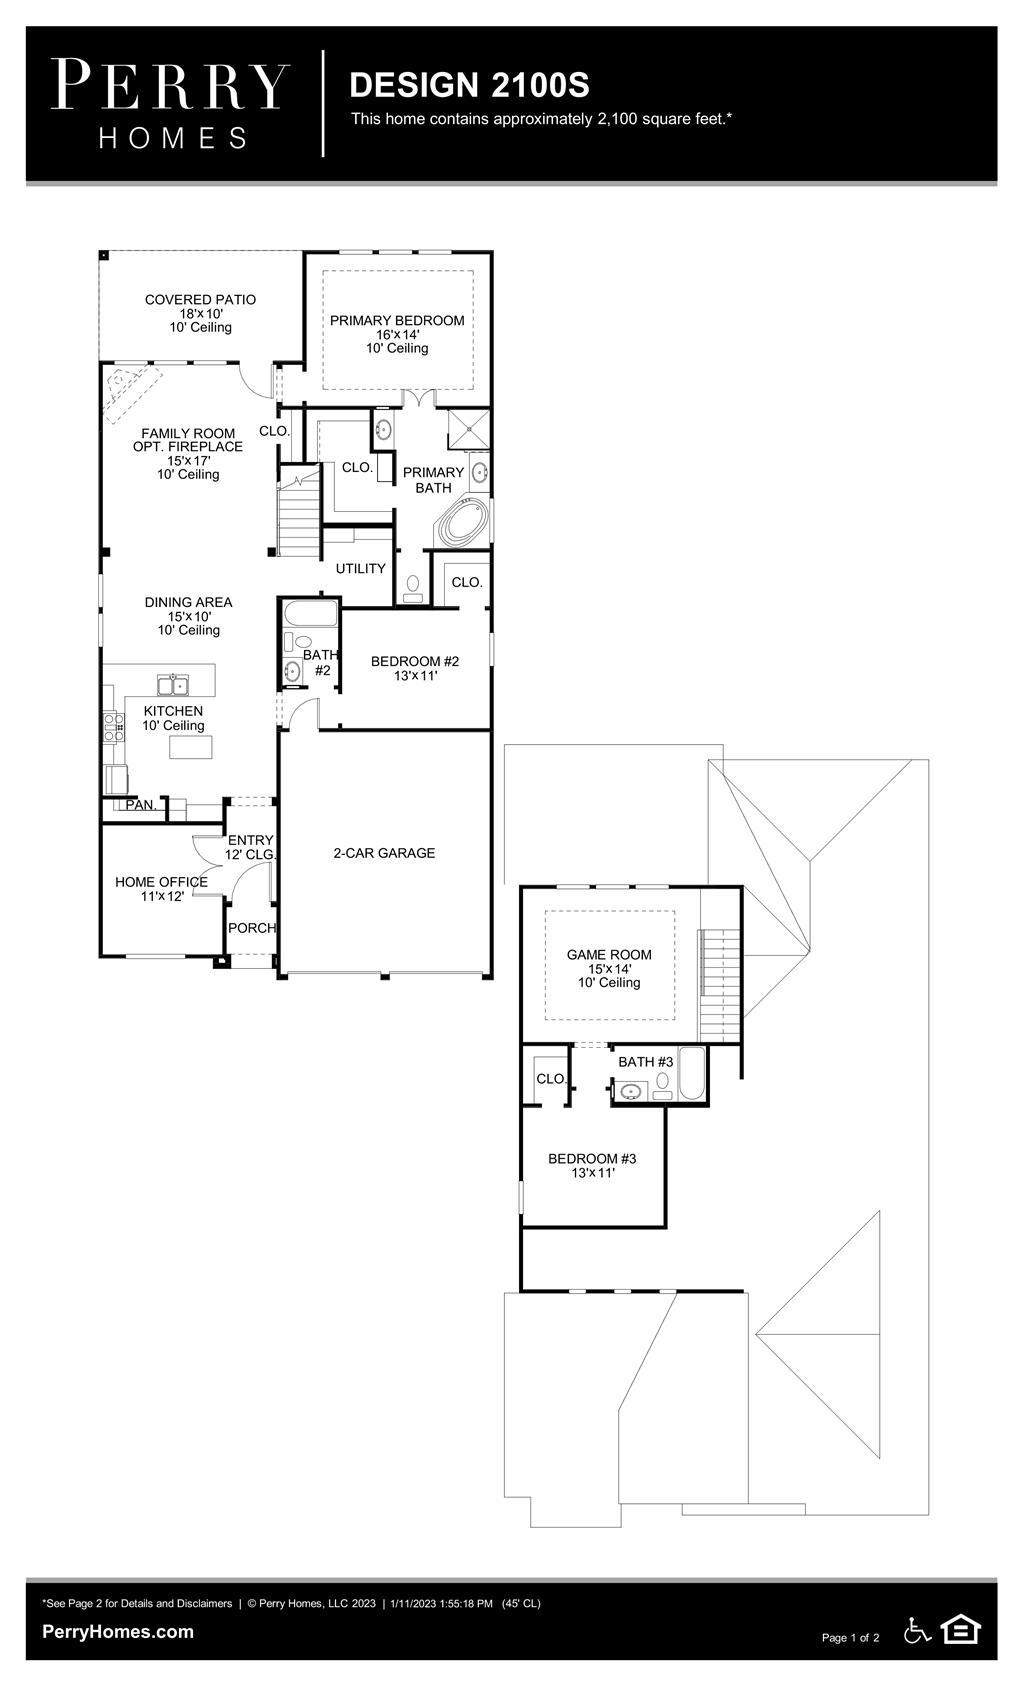 Available To Build In Veramendi 50 U0026 39